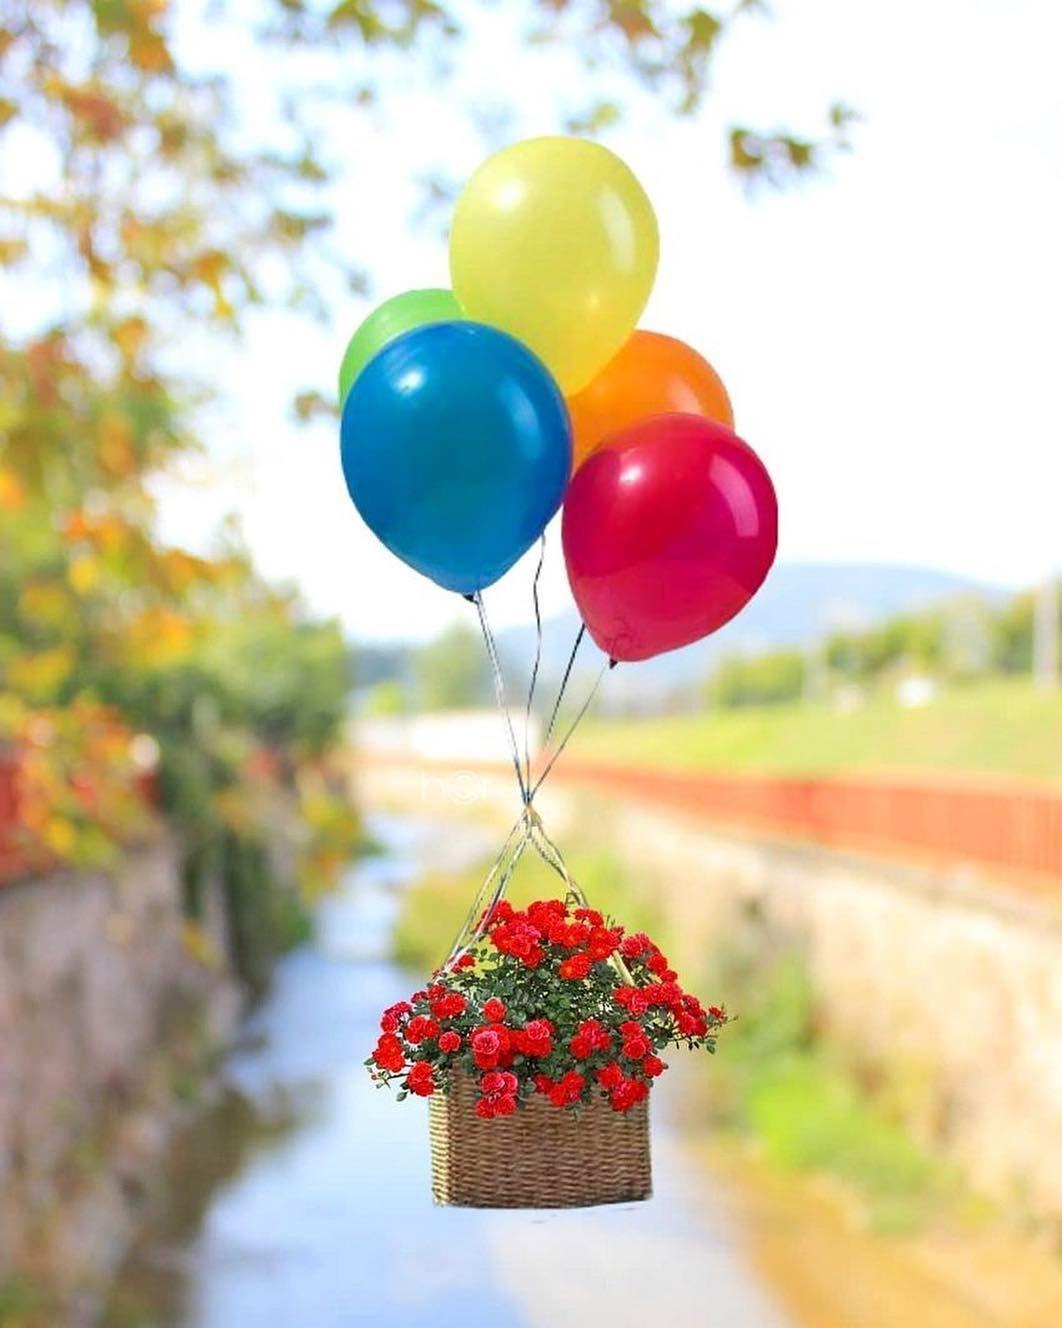 Картинки с шариками солнышком цветами